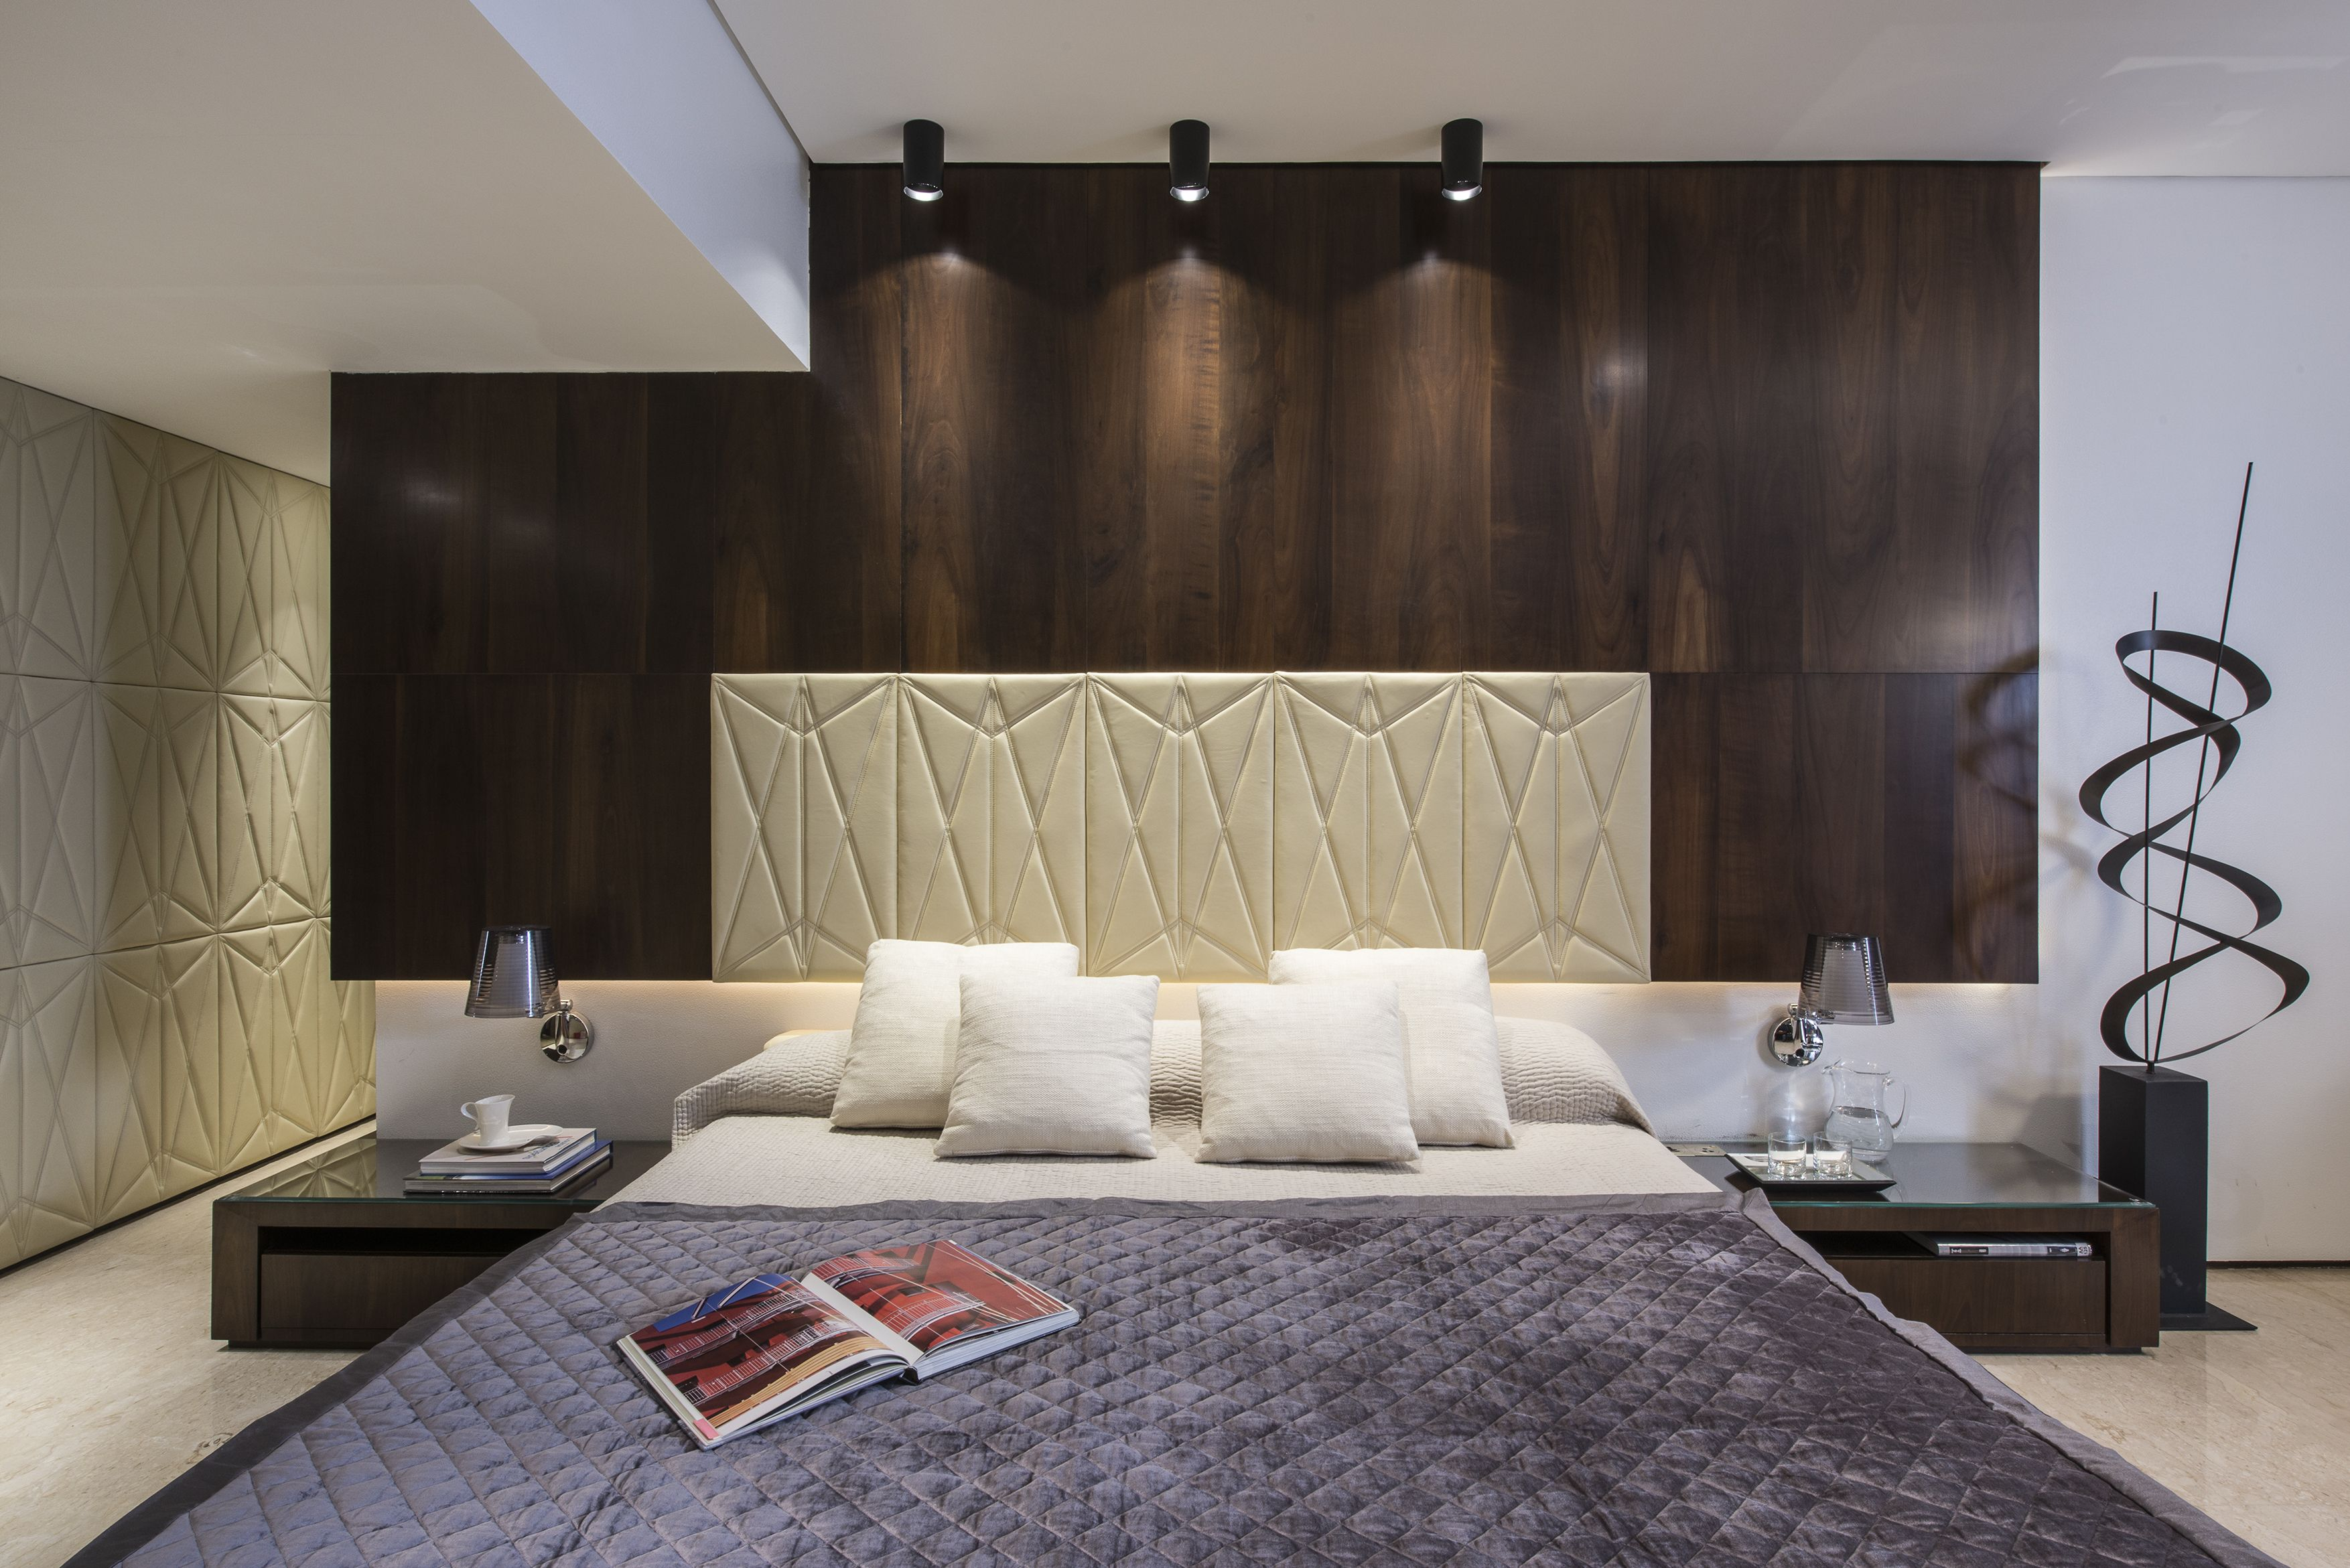 architecture interiors youngarchitects luxurydesign